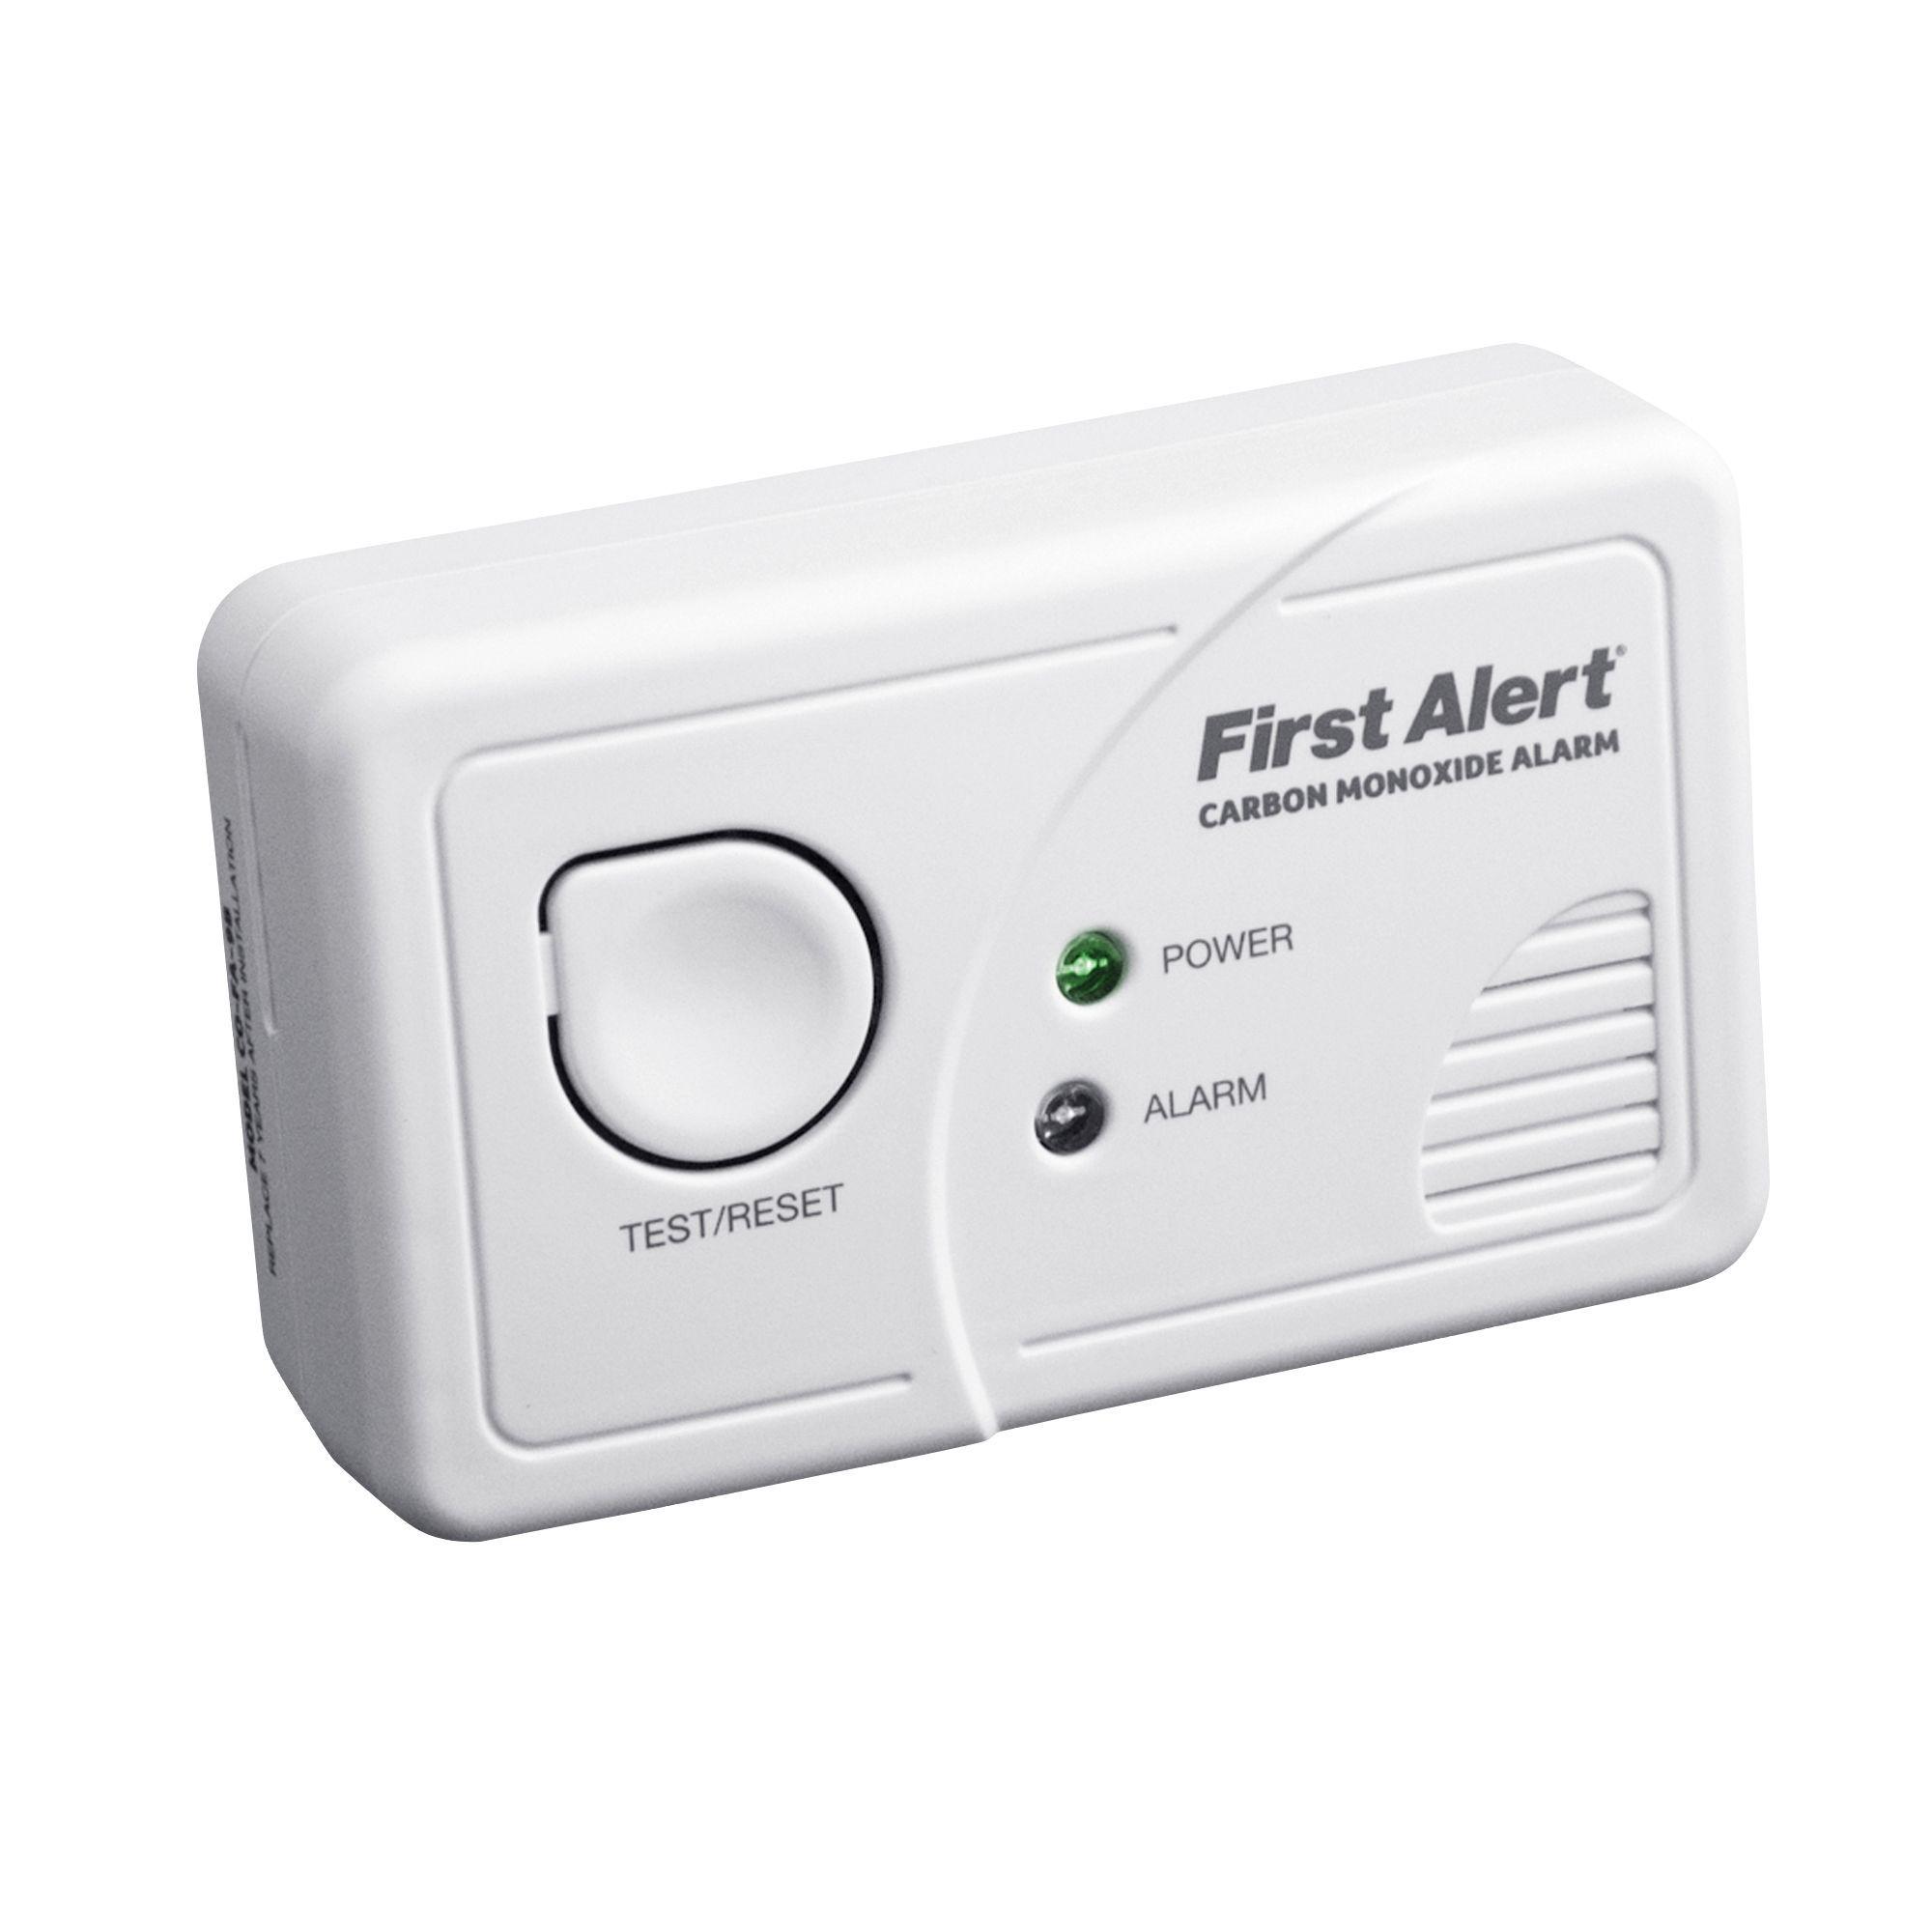 first alert led display co alarm departments diy at b q. Black Bedroom Furniture Sets. Home Design Ideas